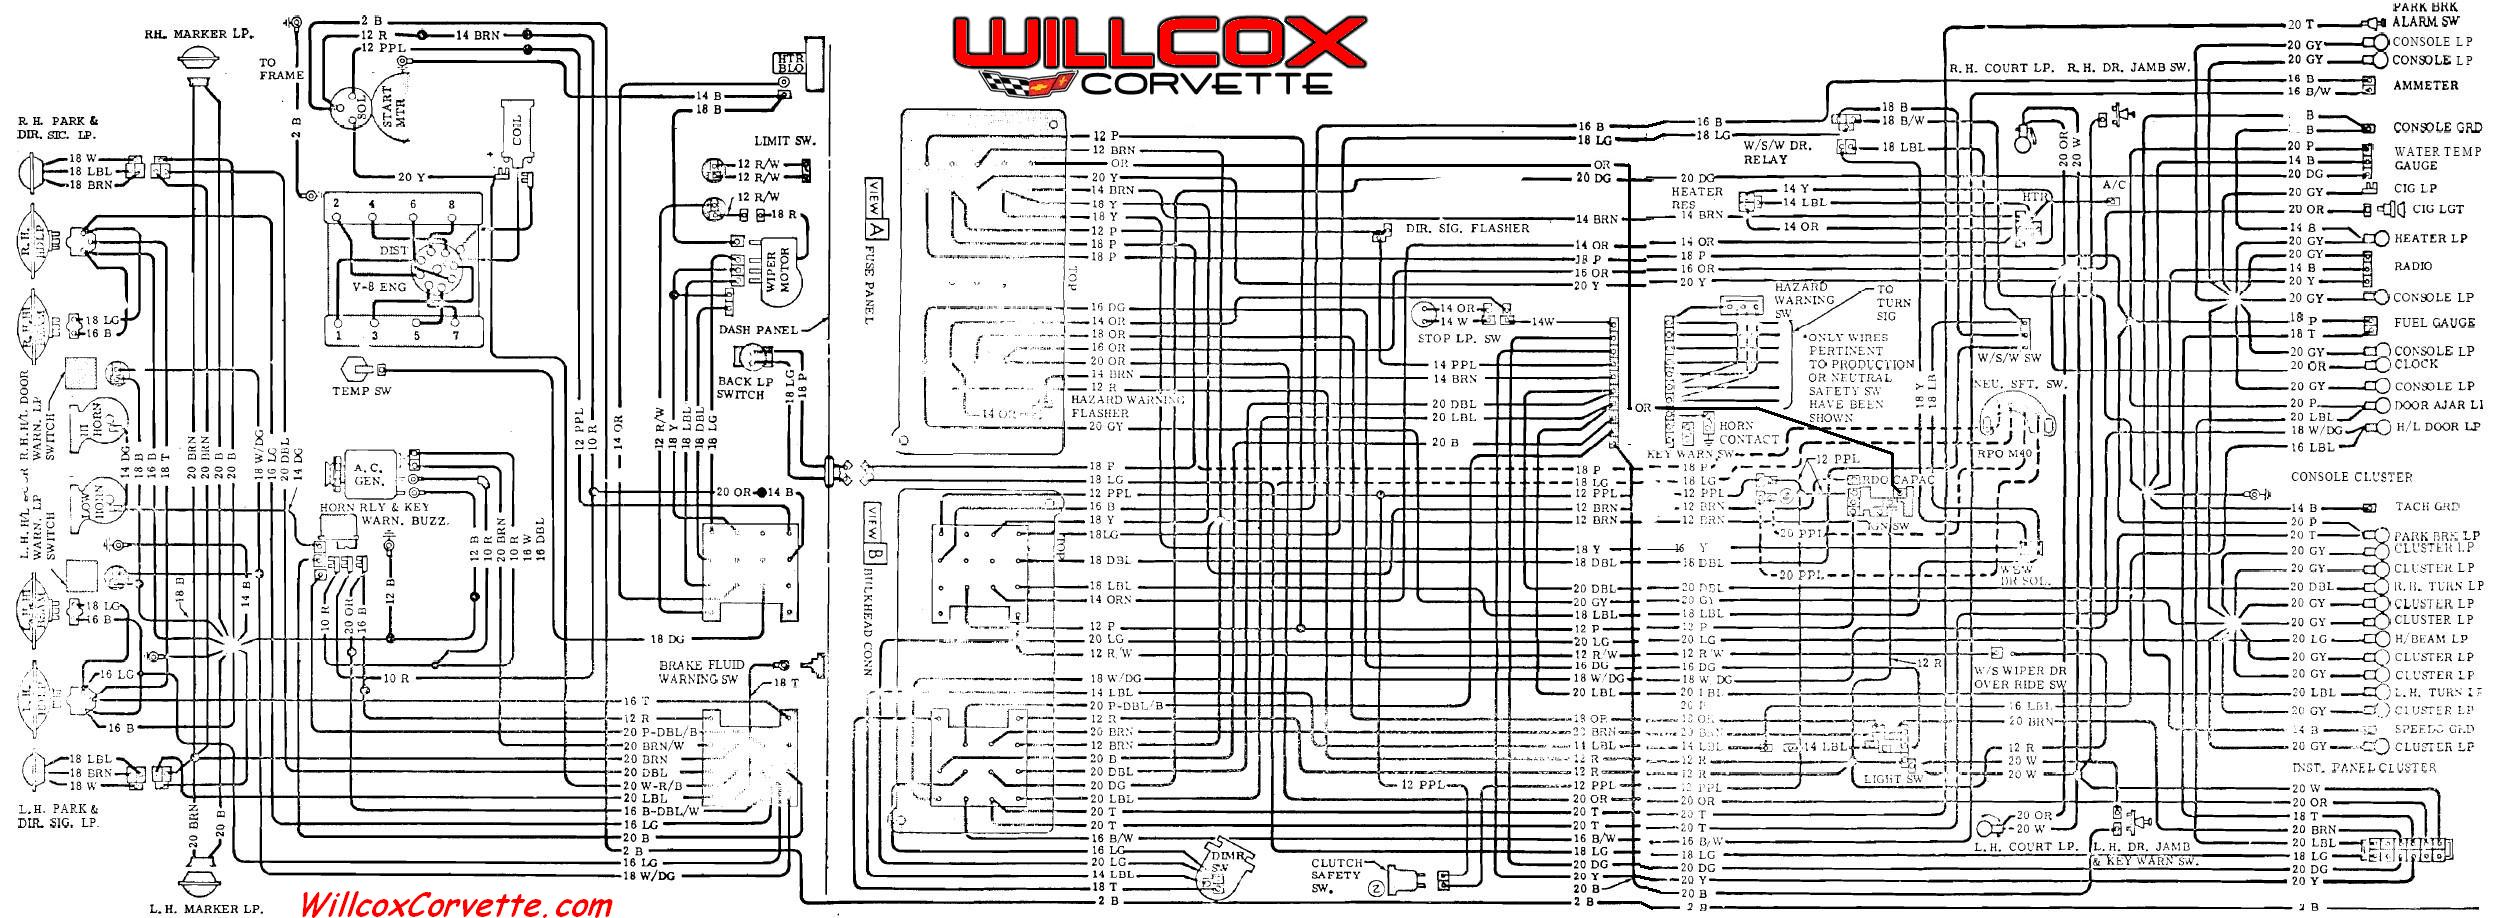 Groovy 72 Corvette Wiring Diagram Wiring Diagram Database Wiring Cloud Hisonepsysticxongrecoveryedborg